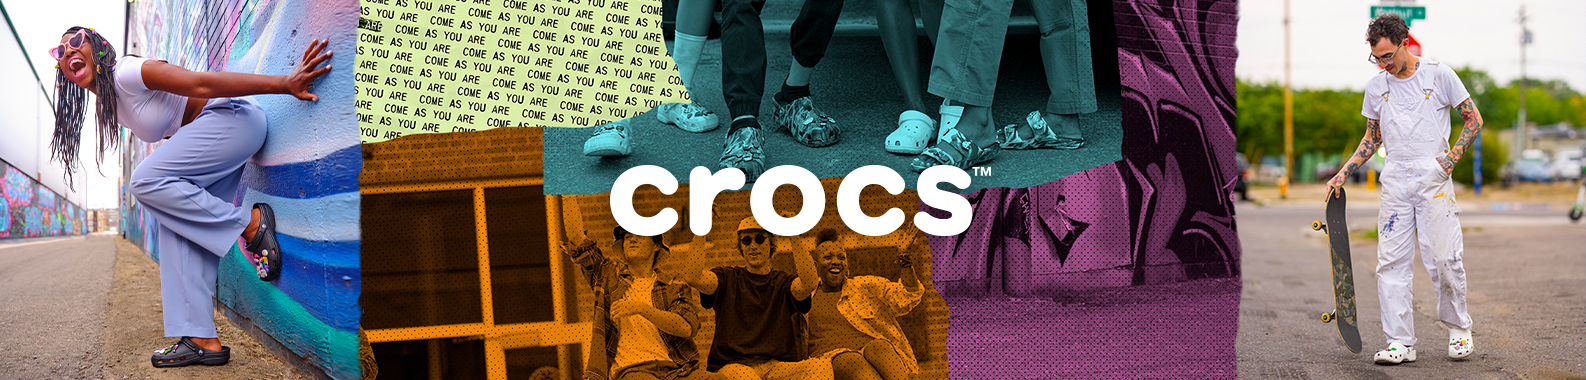 Crocs brand header image